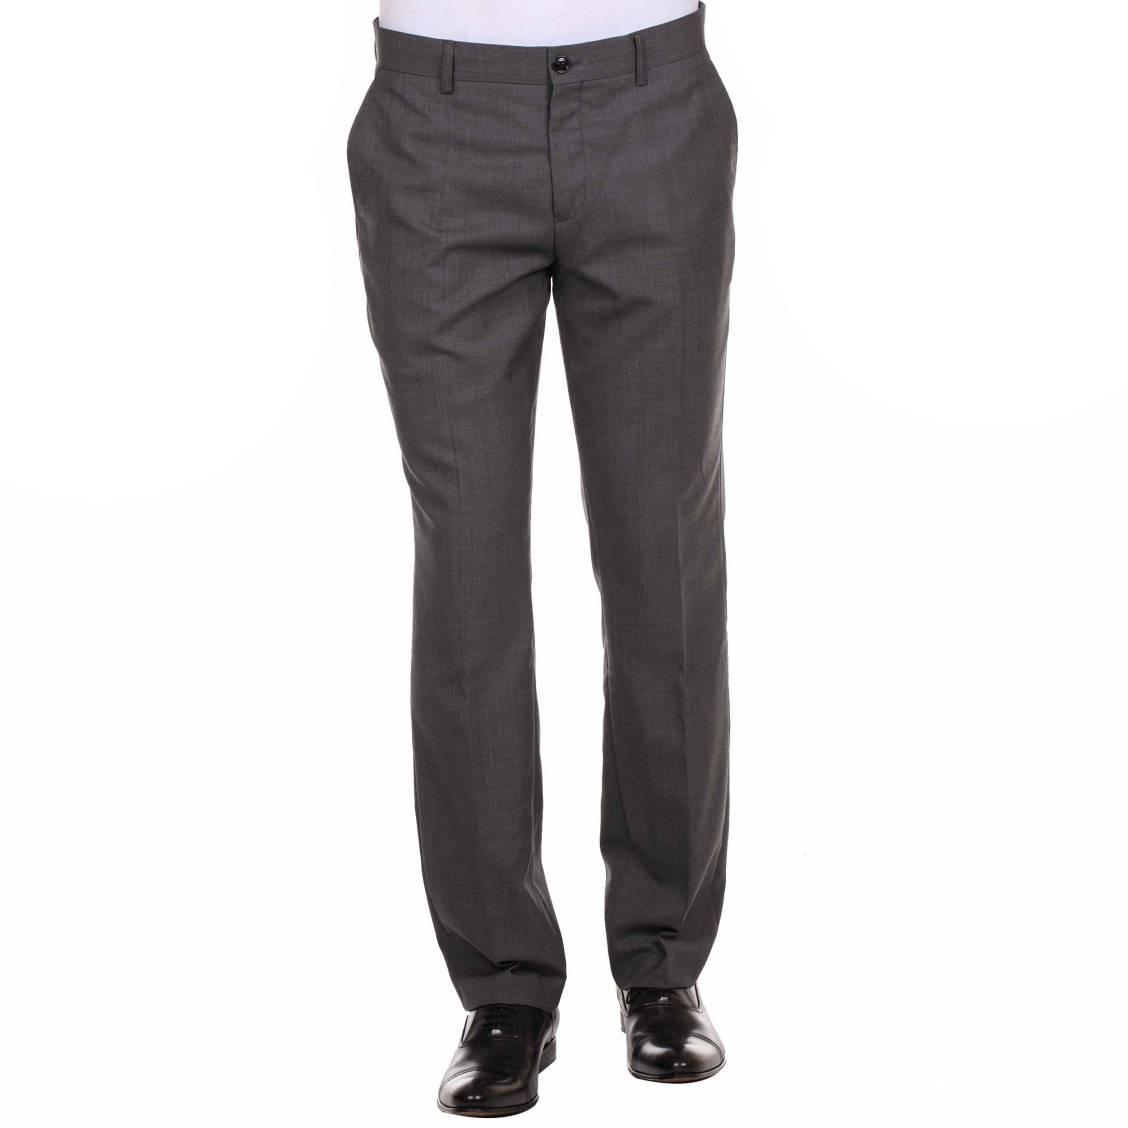 pantalon de costume cintr gris selected rue des hommes. Black Bedroom Furniture Sets. Home Design Ideas